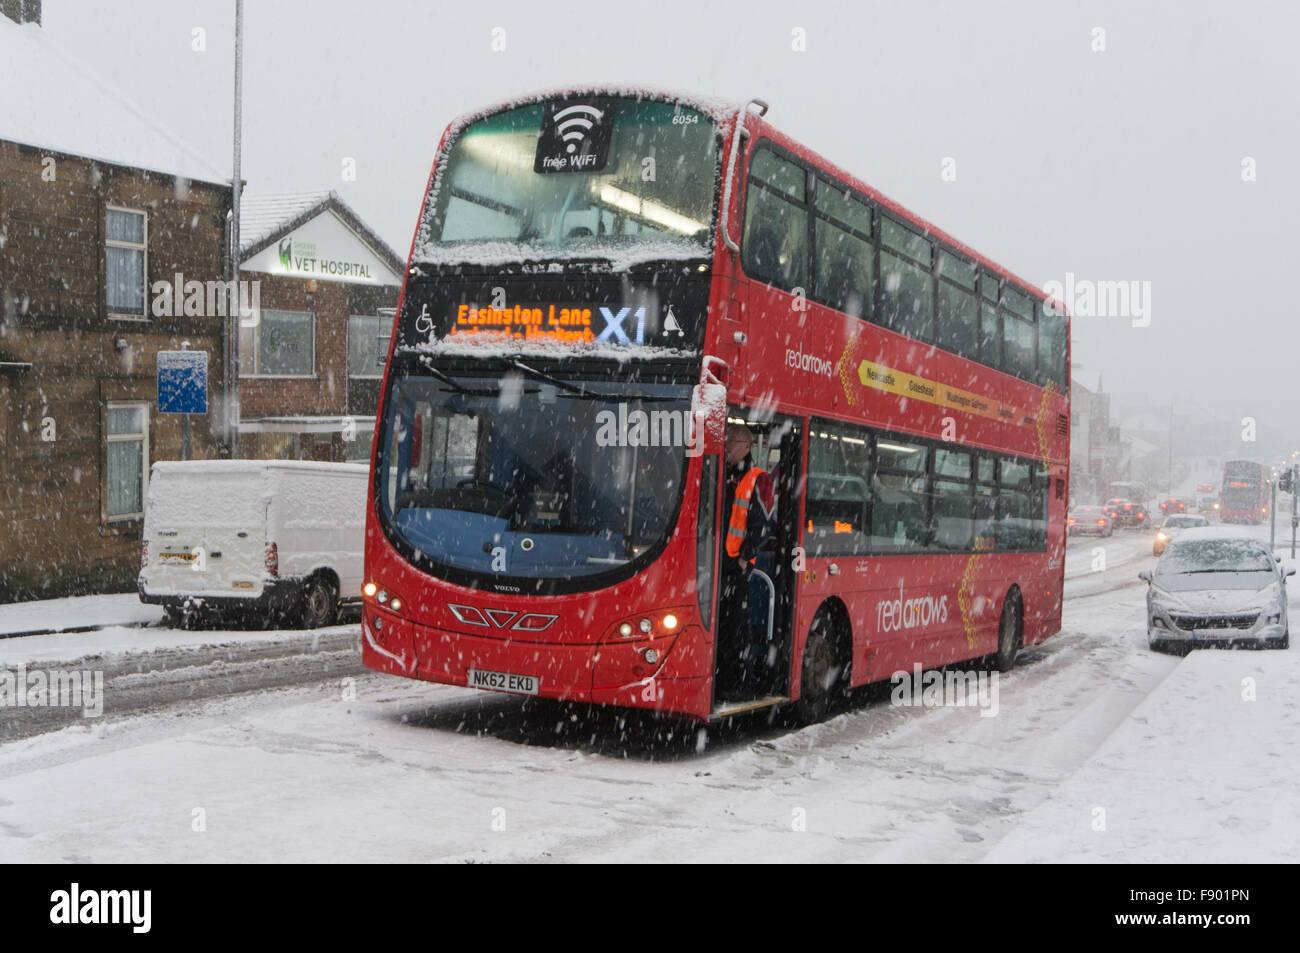 gateshead-uk-12th-dec-2015-snow-brought-